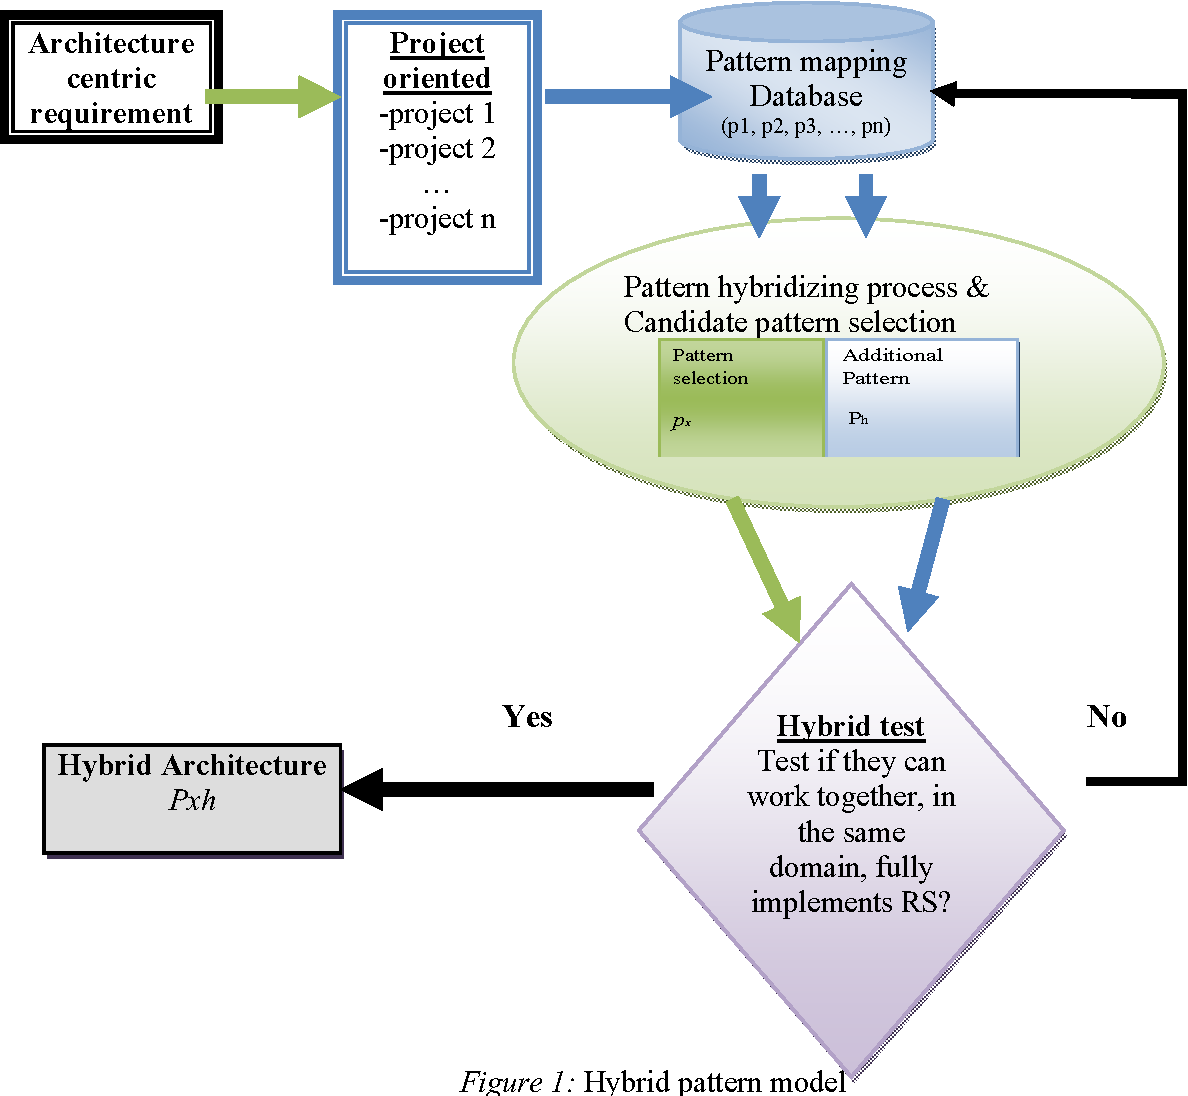 Pdf Hybrid Software Architecture Design Pattern Model Semantic Scholar